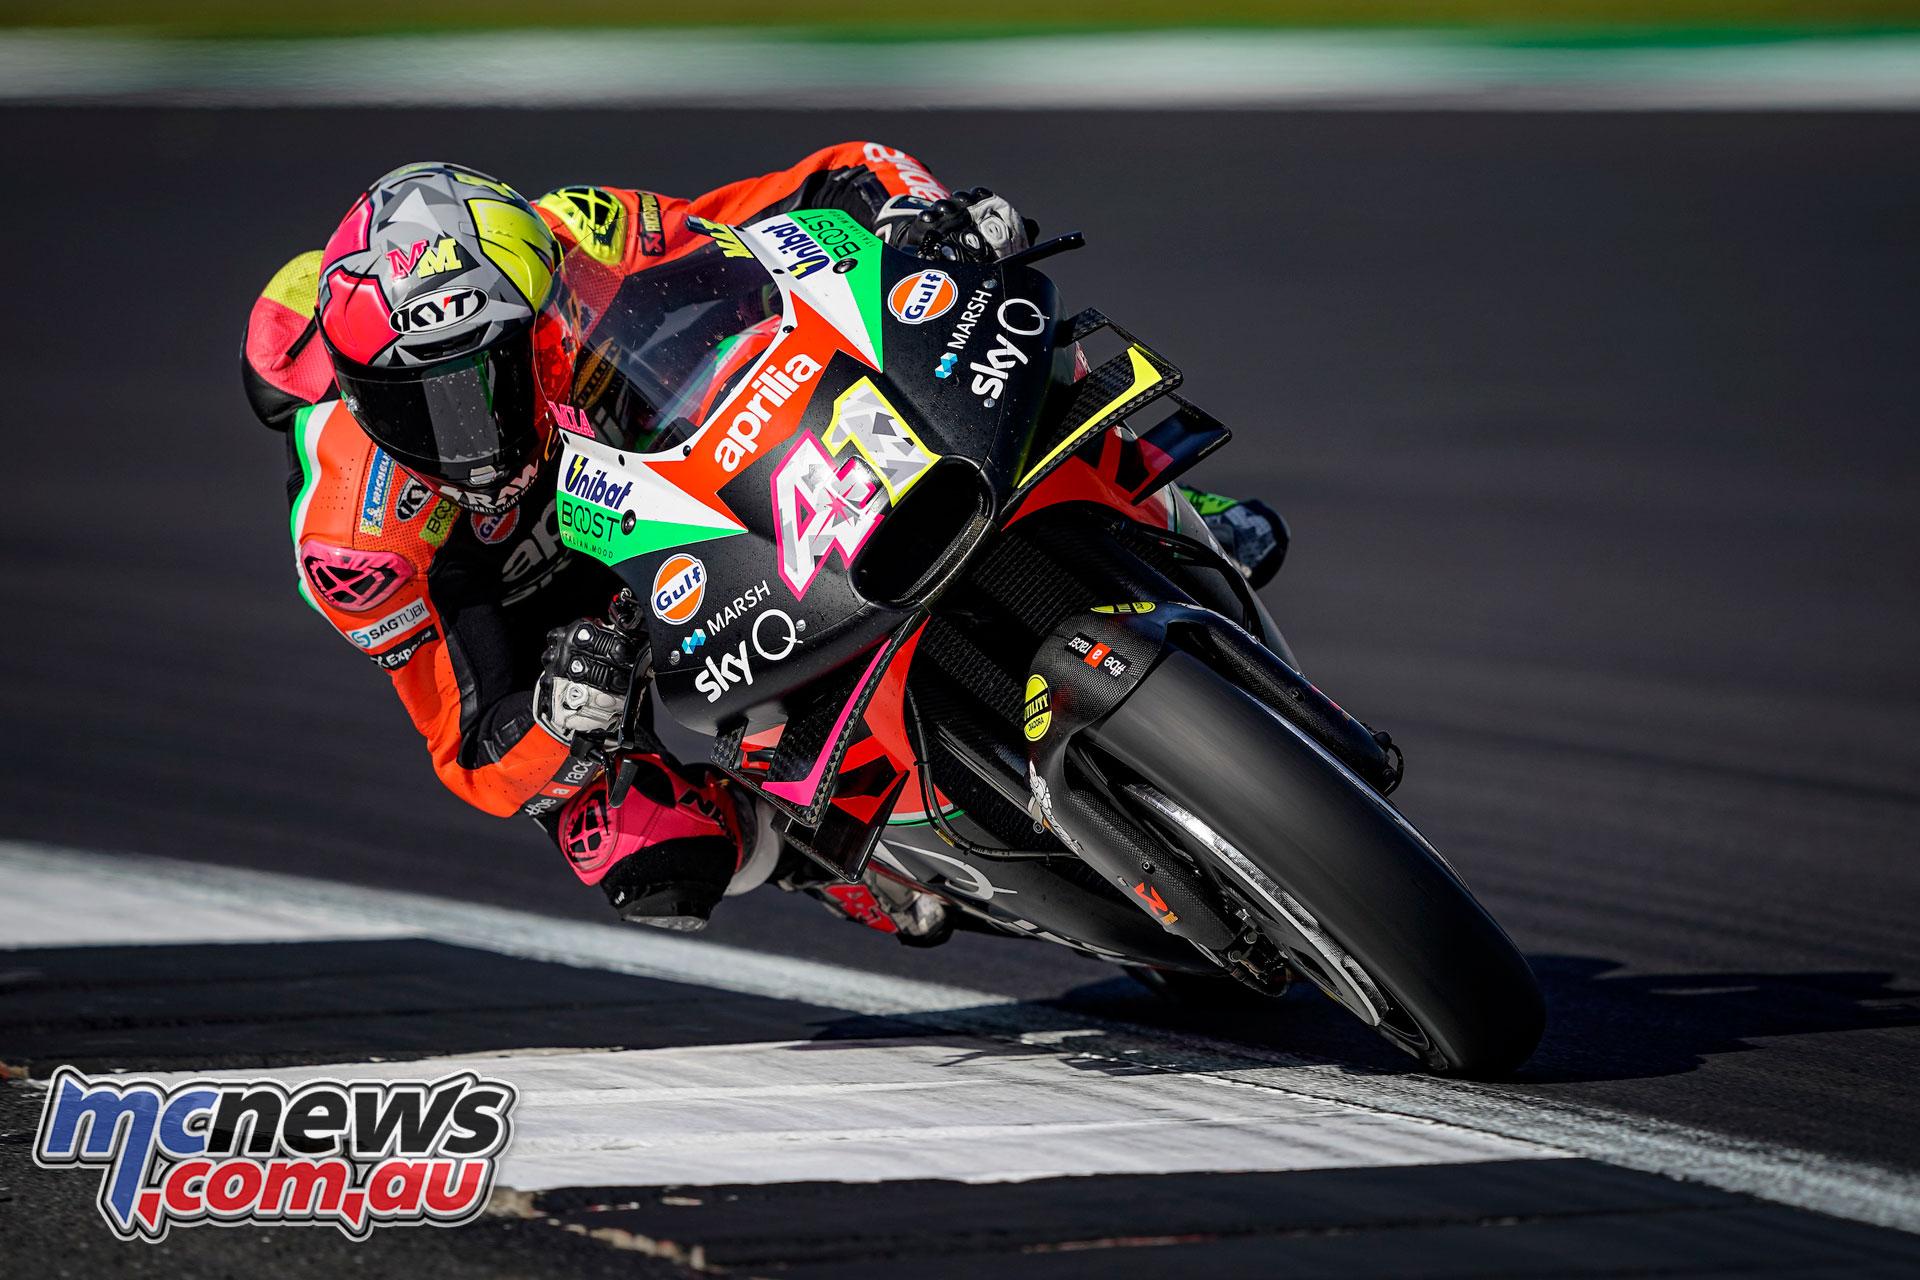 MotoGP Rnd Silverstone Aleix Espargaro